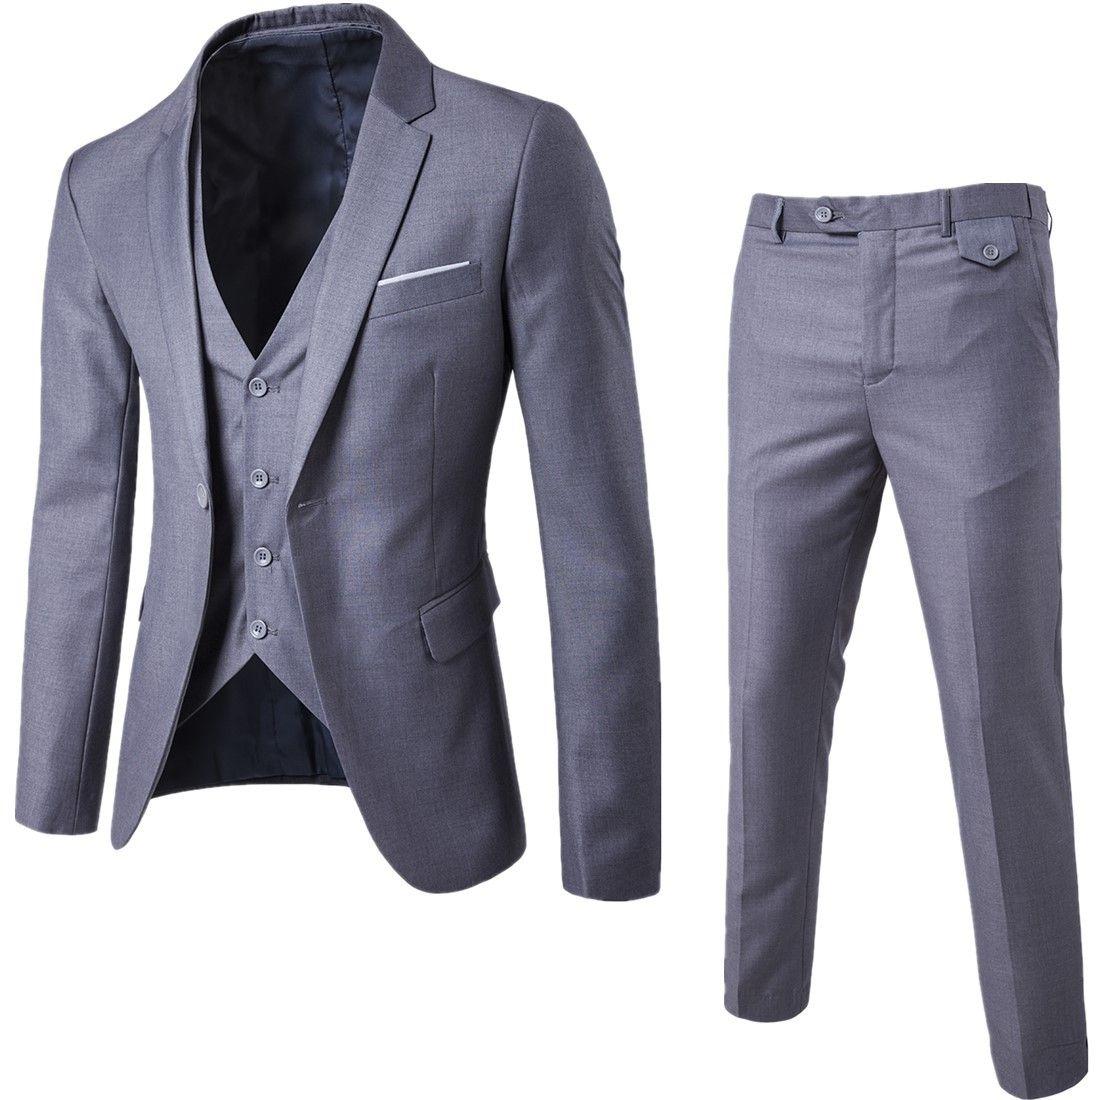 Männer Anzug Slim Fit New Silm Fit besten Mann Anzug blau Groomsman Mens Hochzeit Prom Anzüge